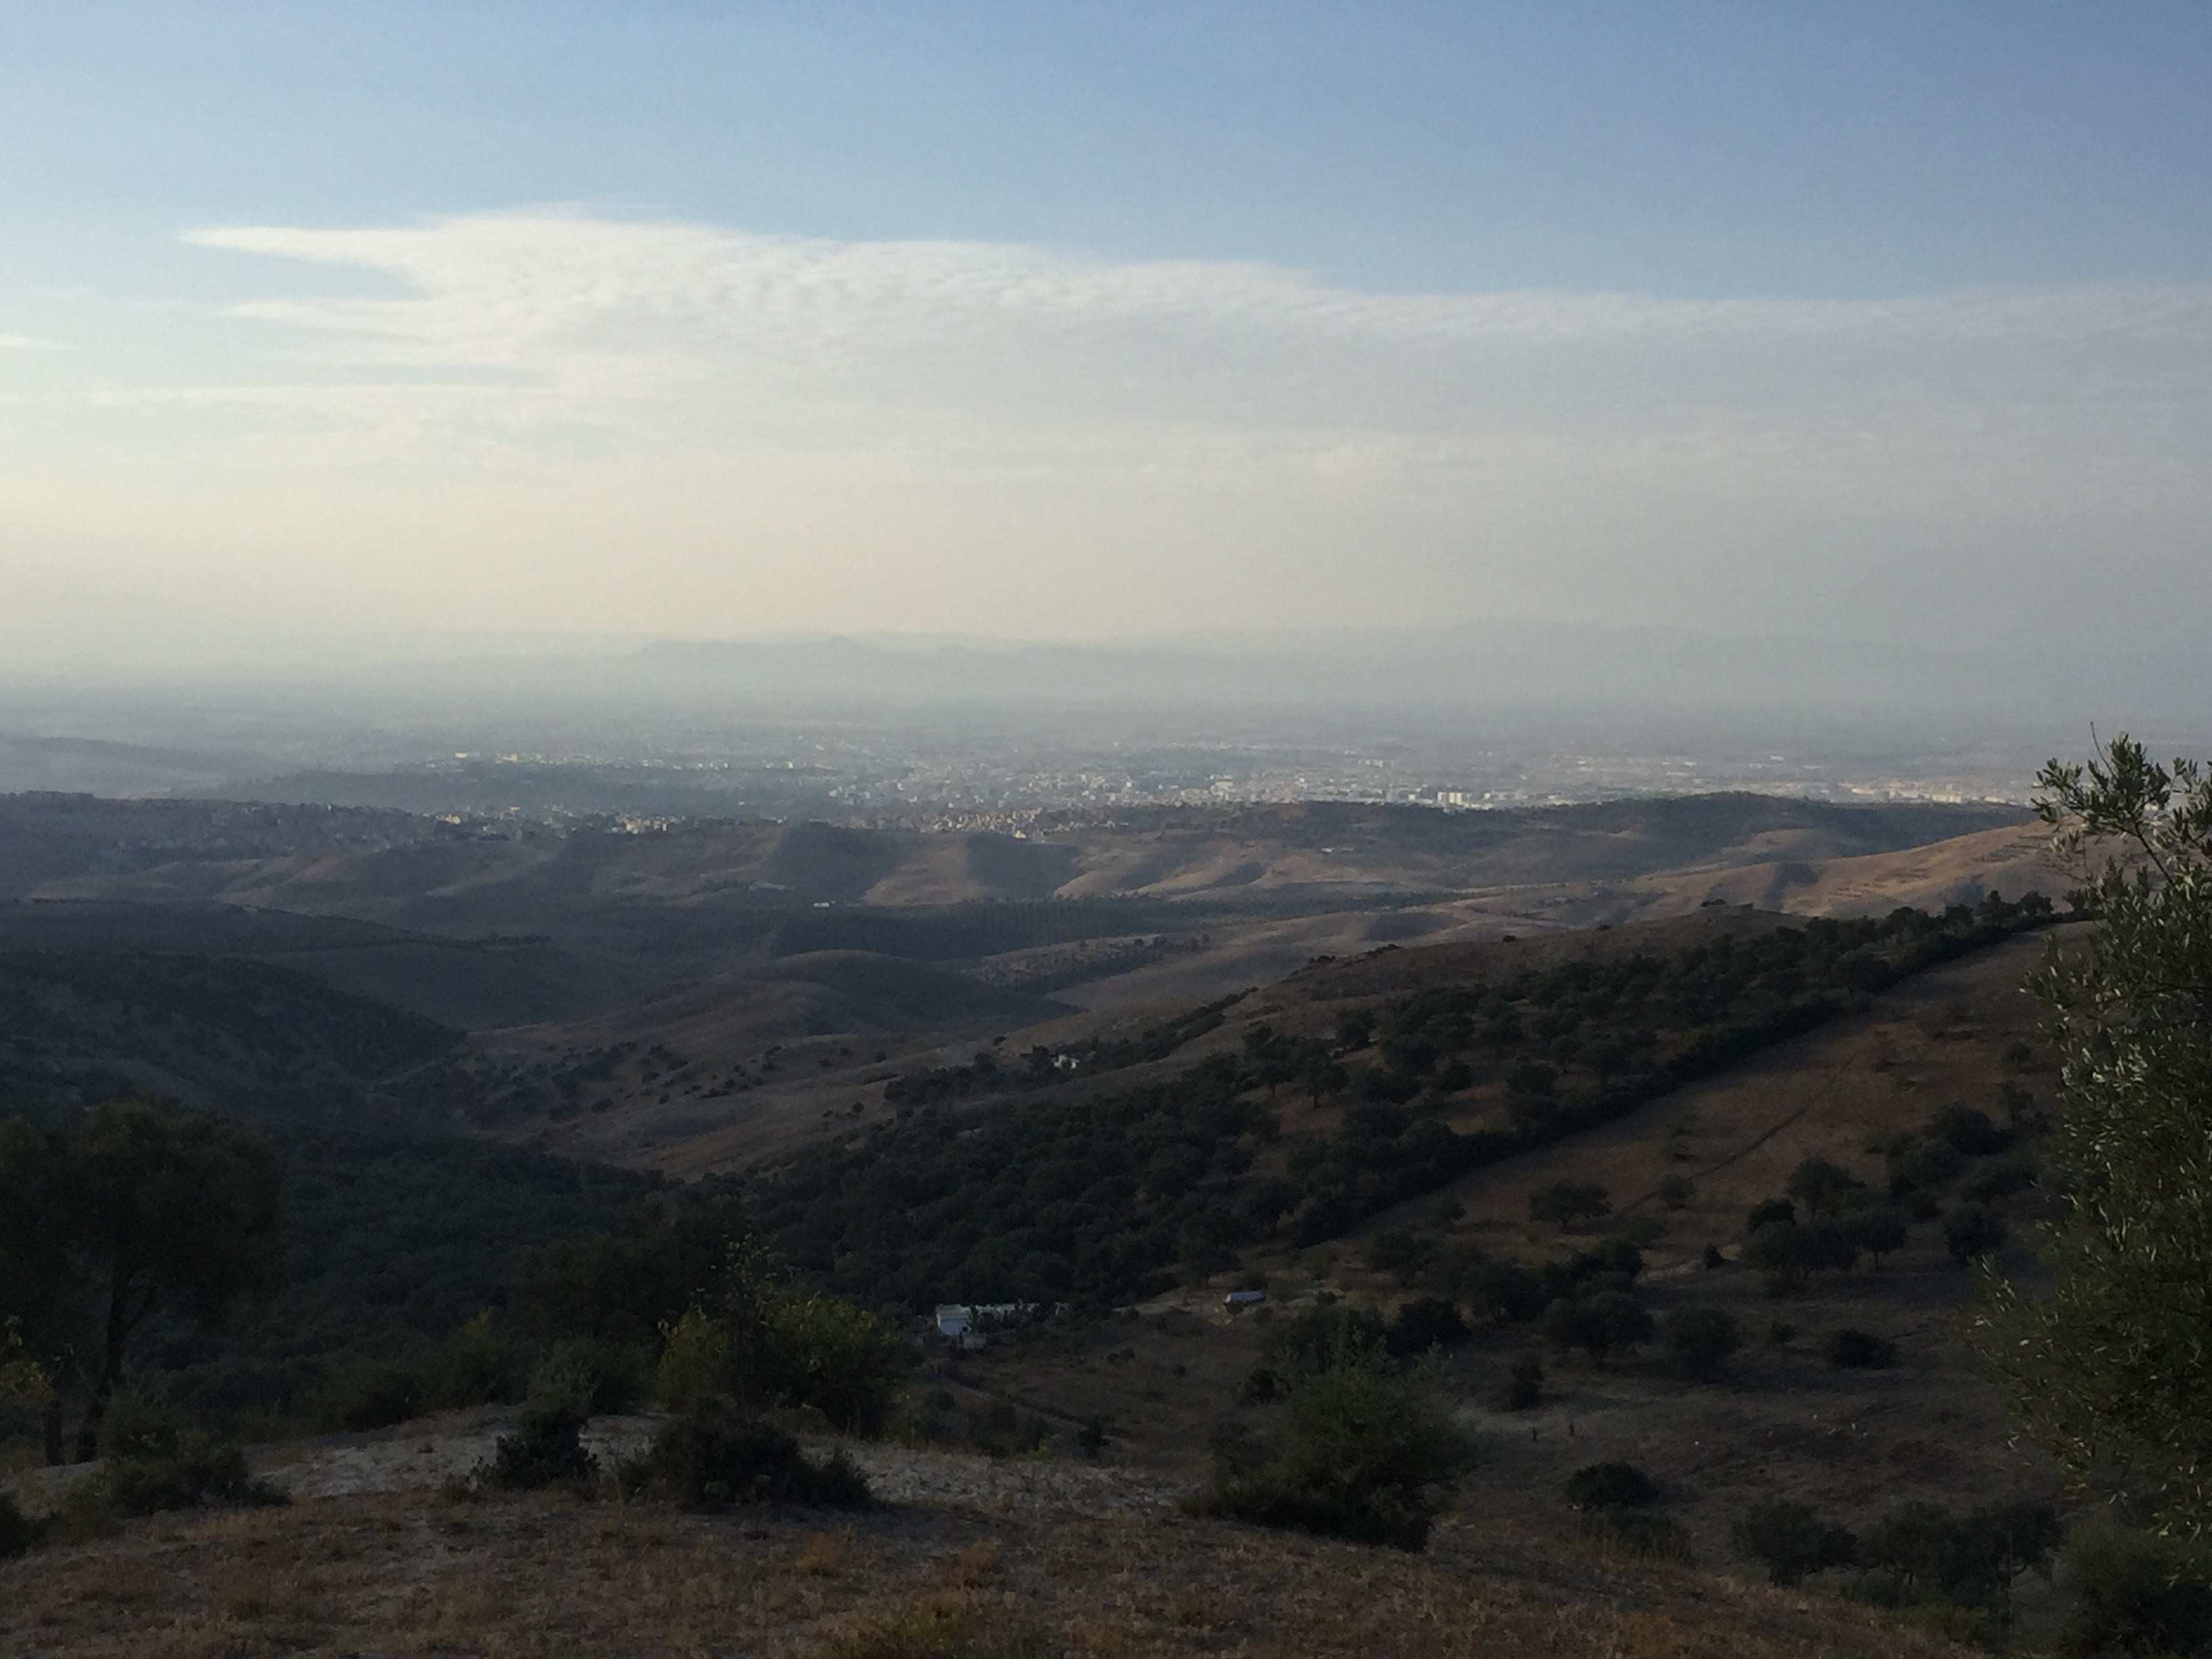 Moroccan landscape. Photo: Rune Friis/The Turban Times.